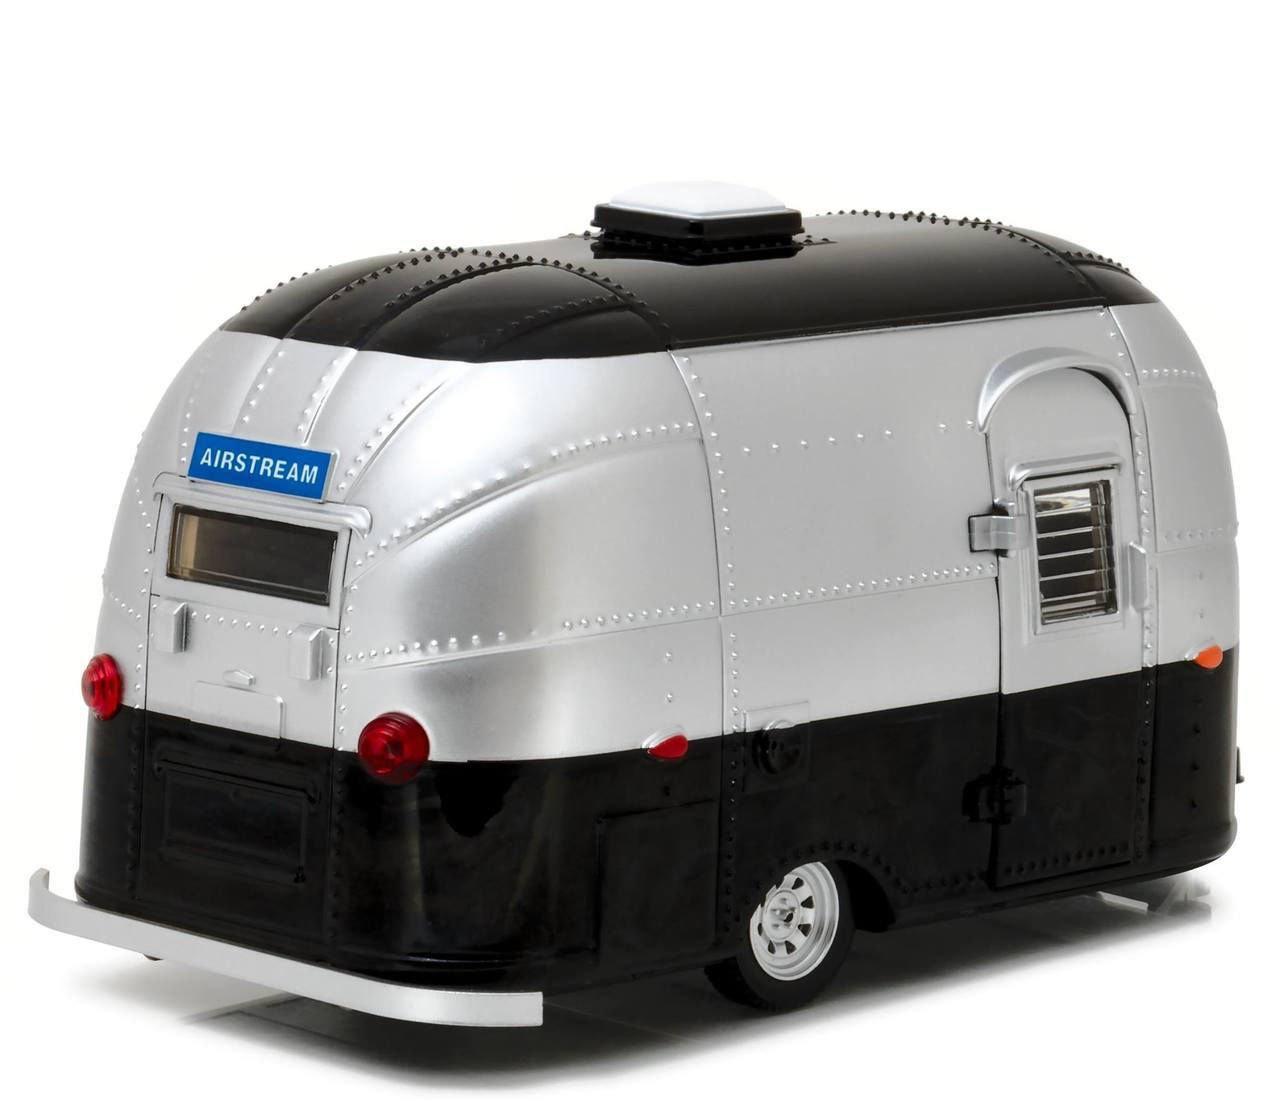 Airstream Travel Trailer >> Amazon Com Greenlight 18226 Airstream Bambi 16 Camper Trailer